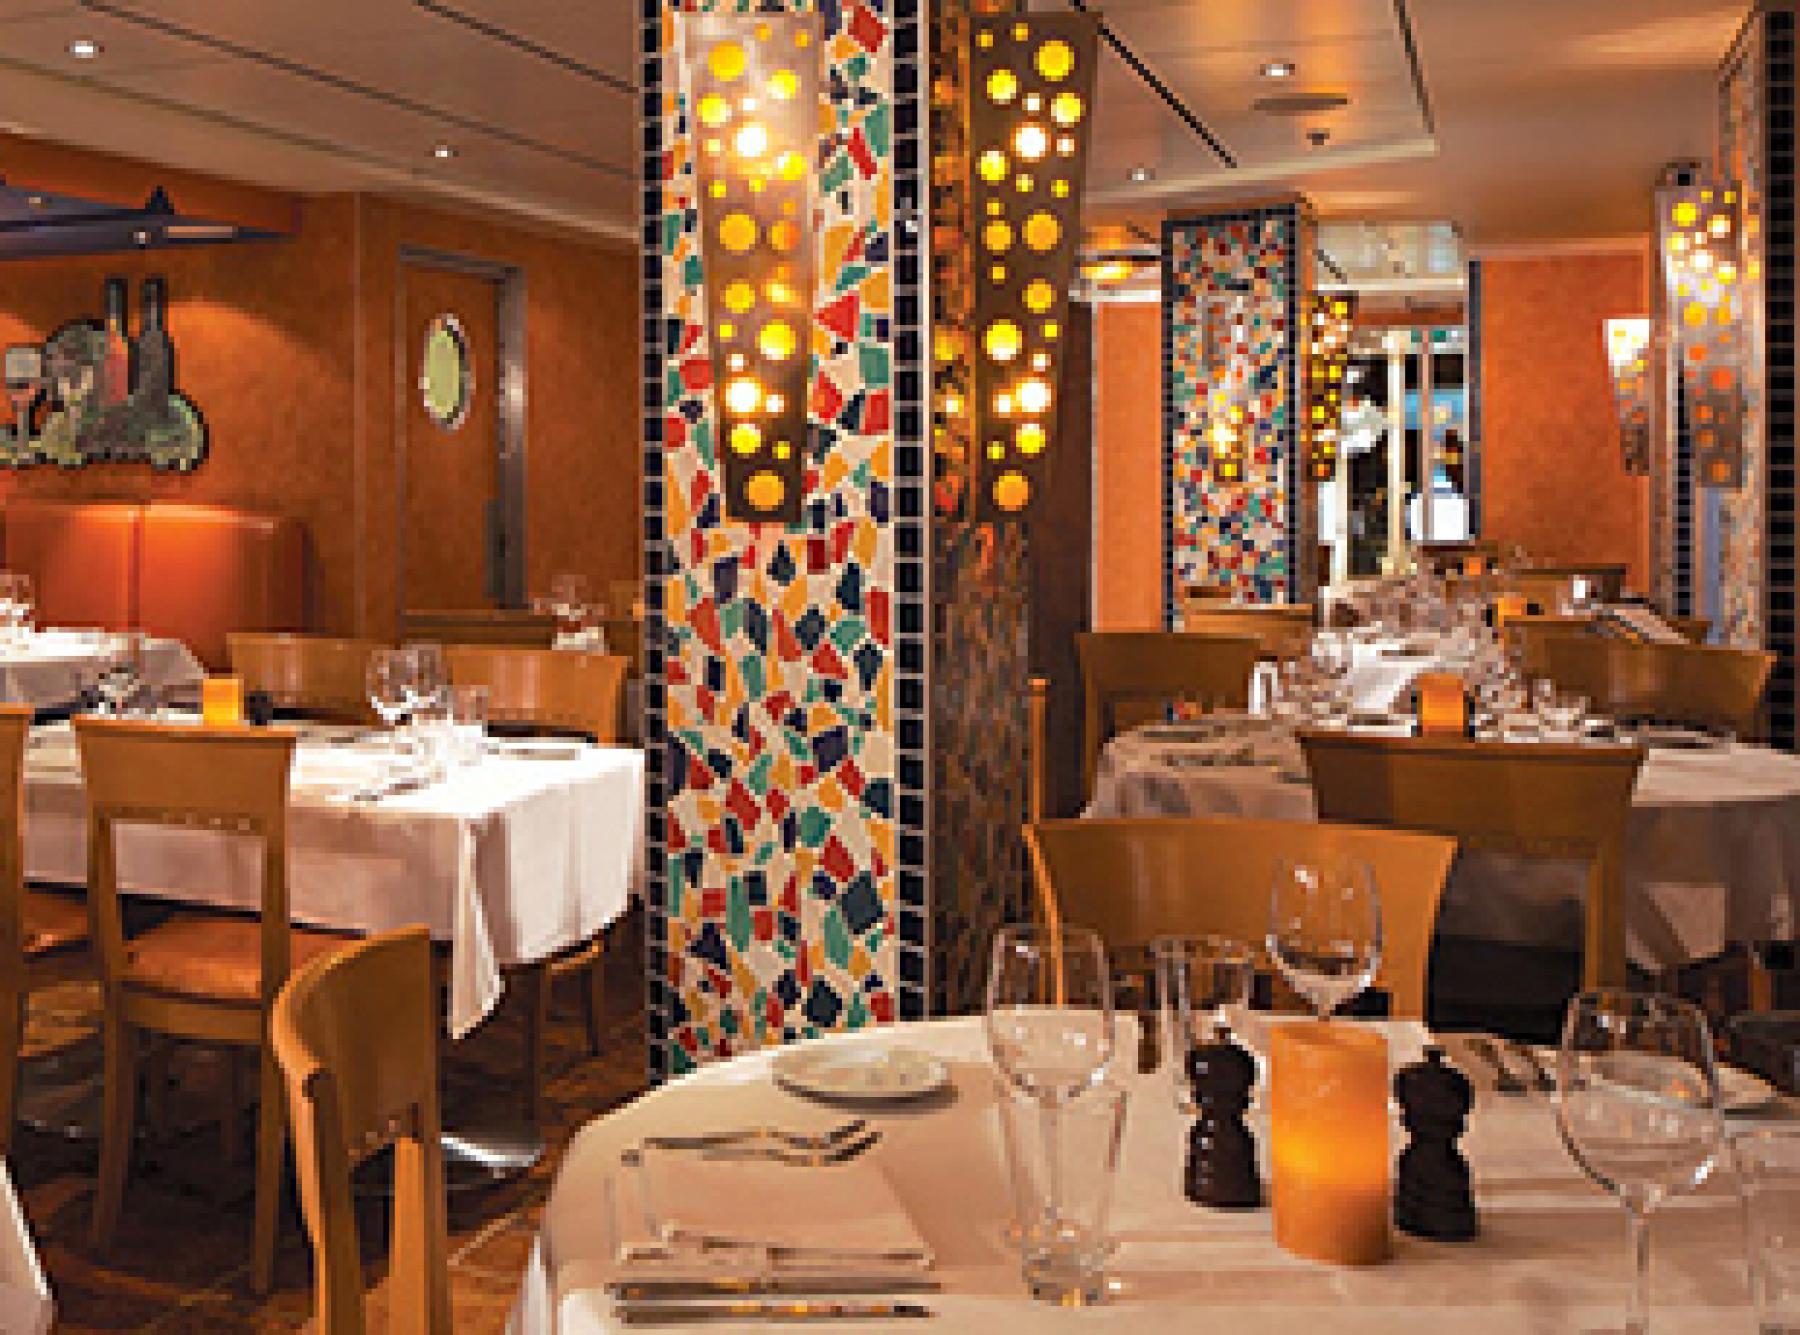 Norwegian Cruise Line Pride of America Interior little italy.jpg